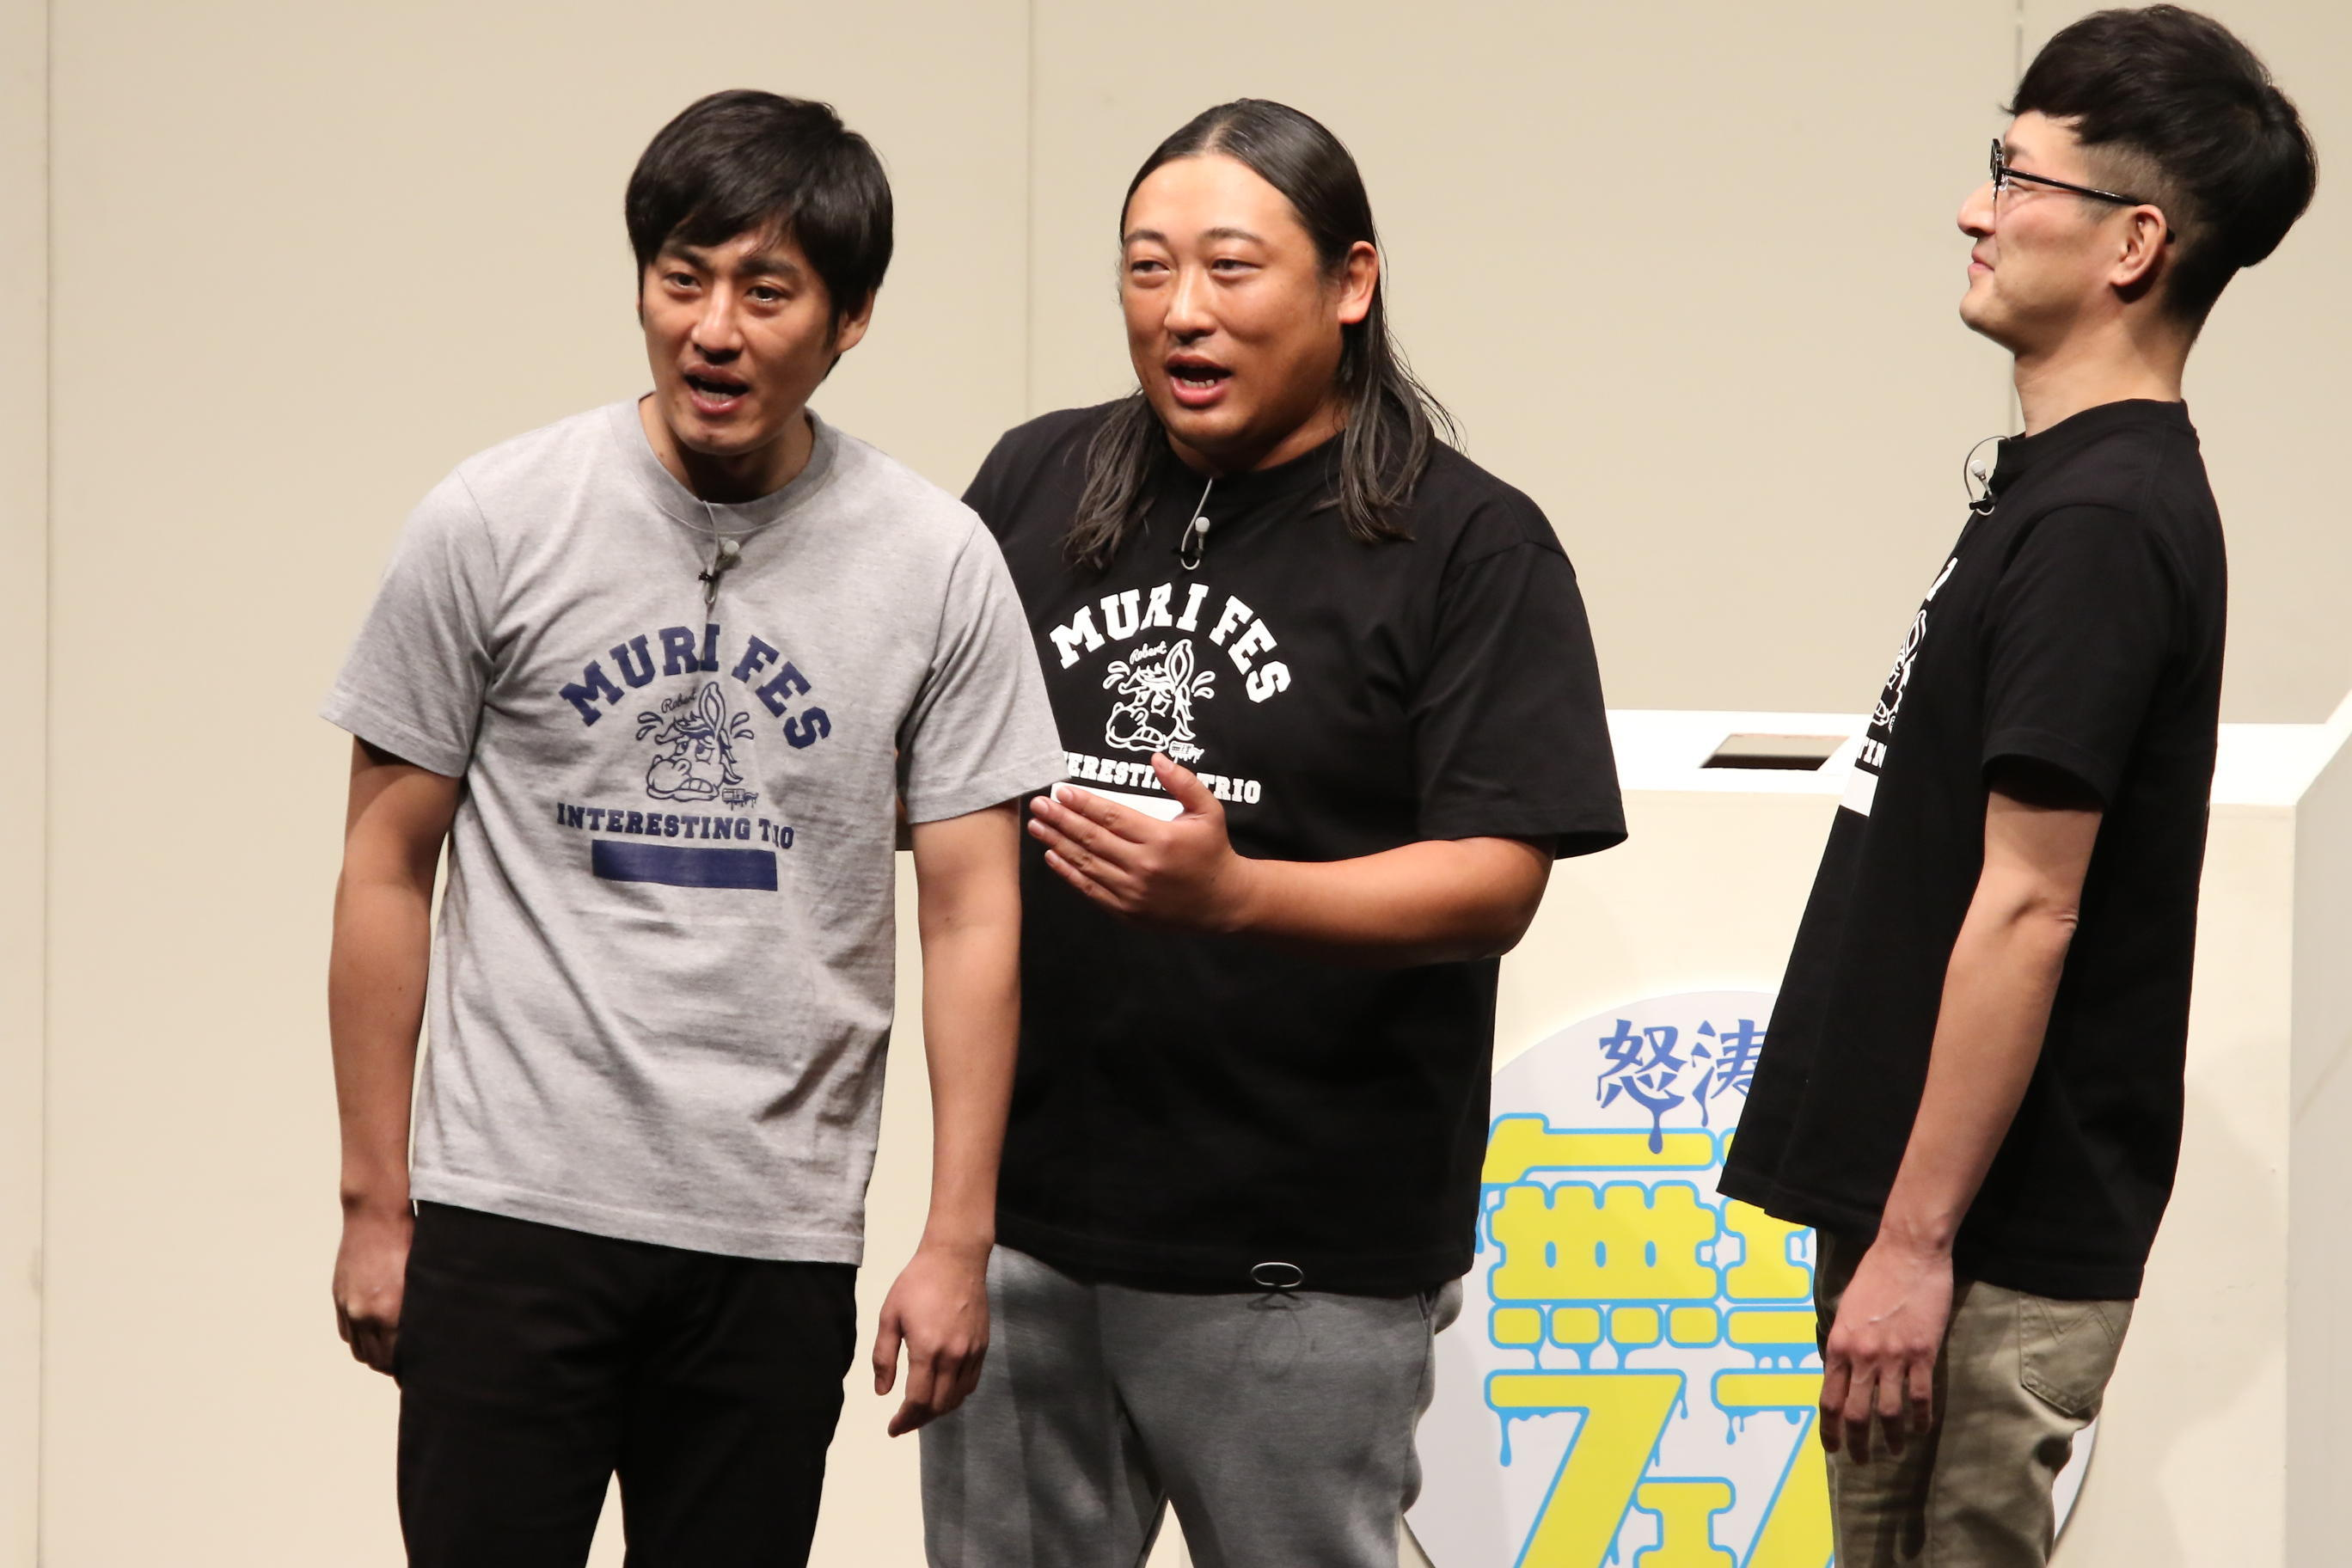 http://news.yoshimoto.co.jp/20190111101053-e05d8932b403e5137bf85107ddaf26289282e035.jpg